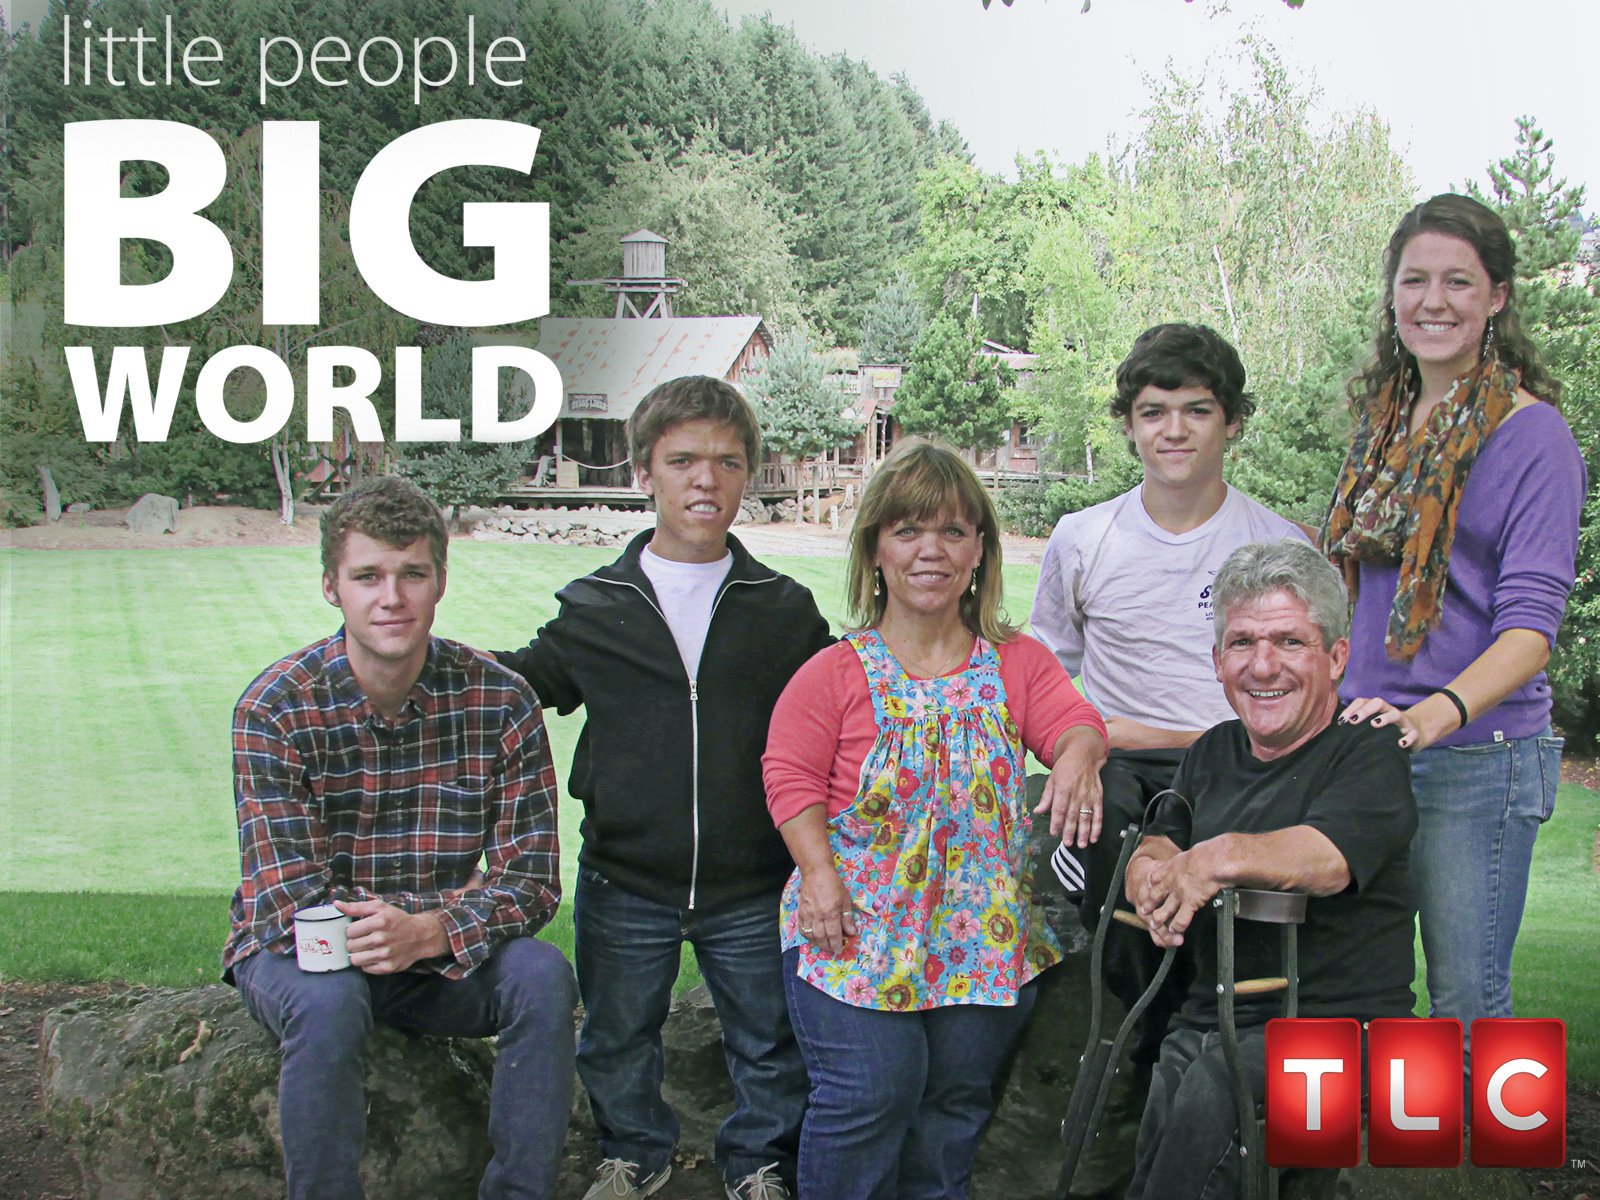 'Little People Big World' (TLC)